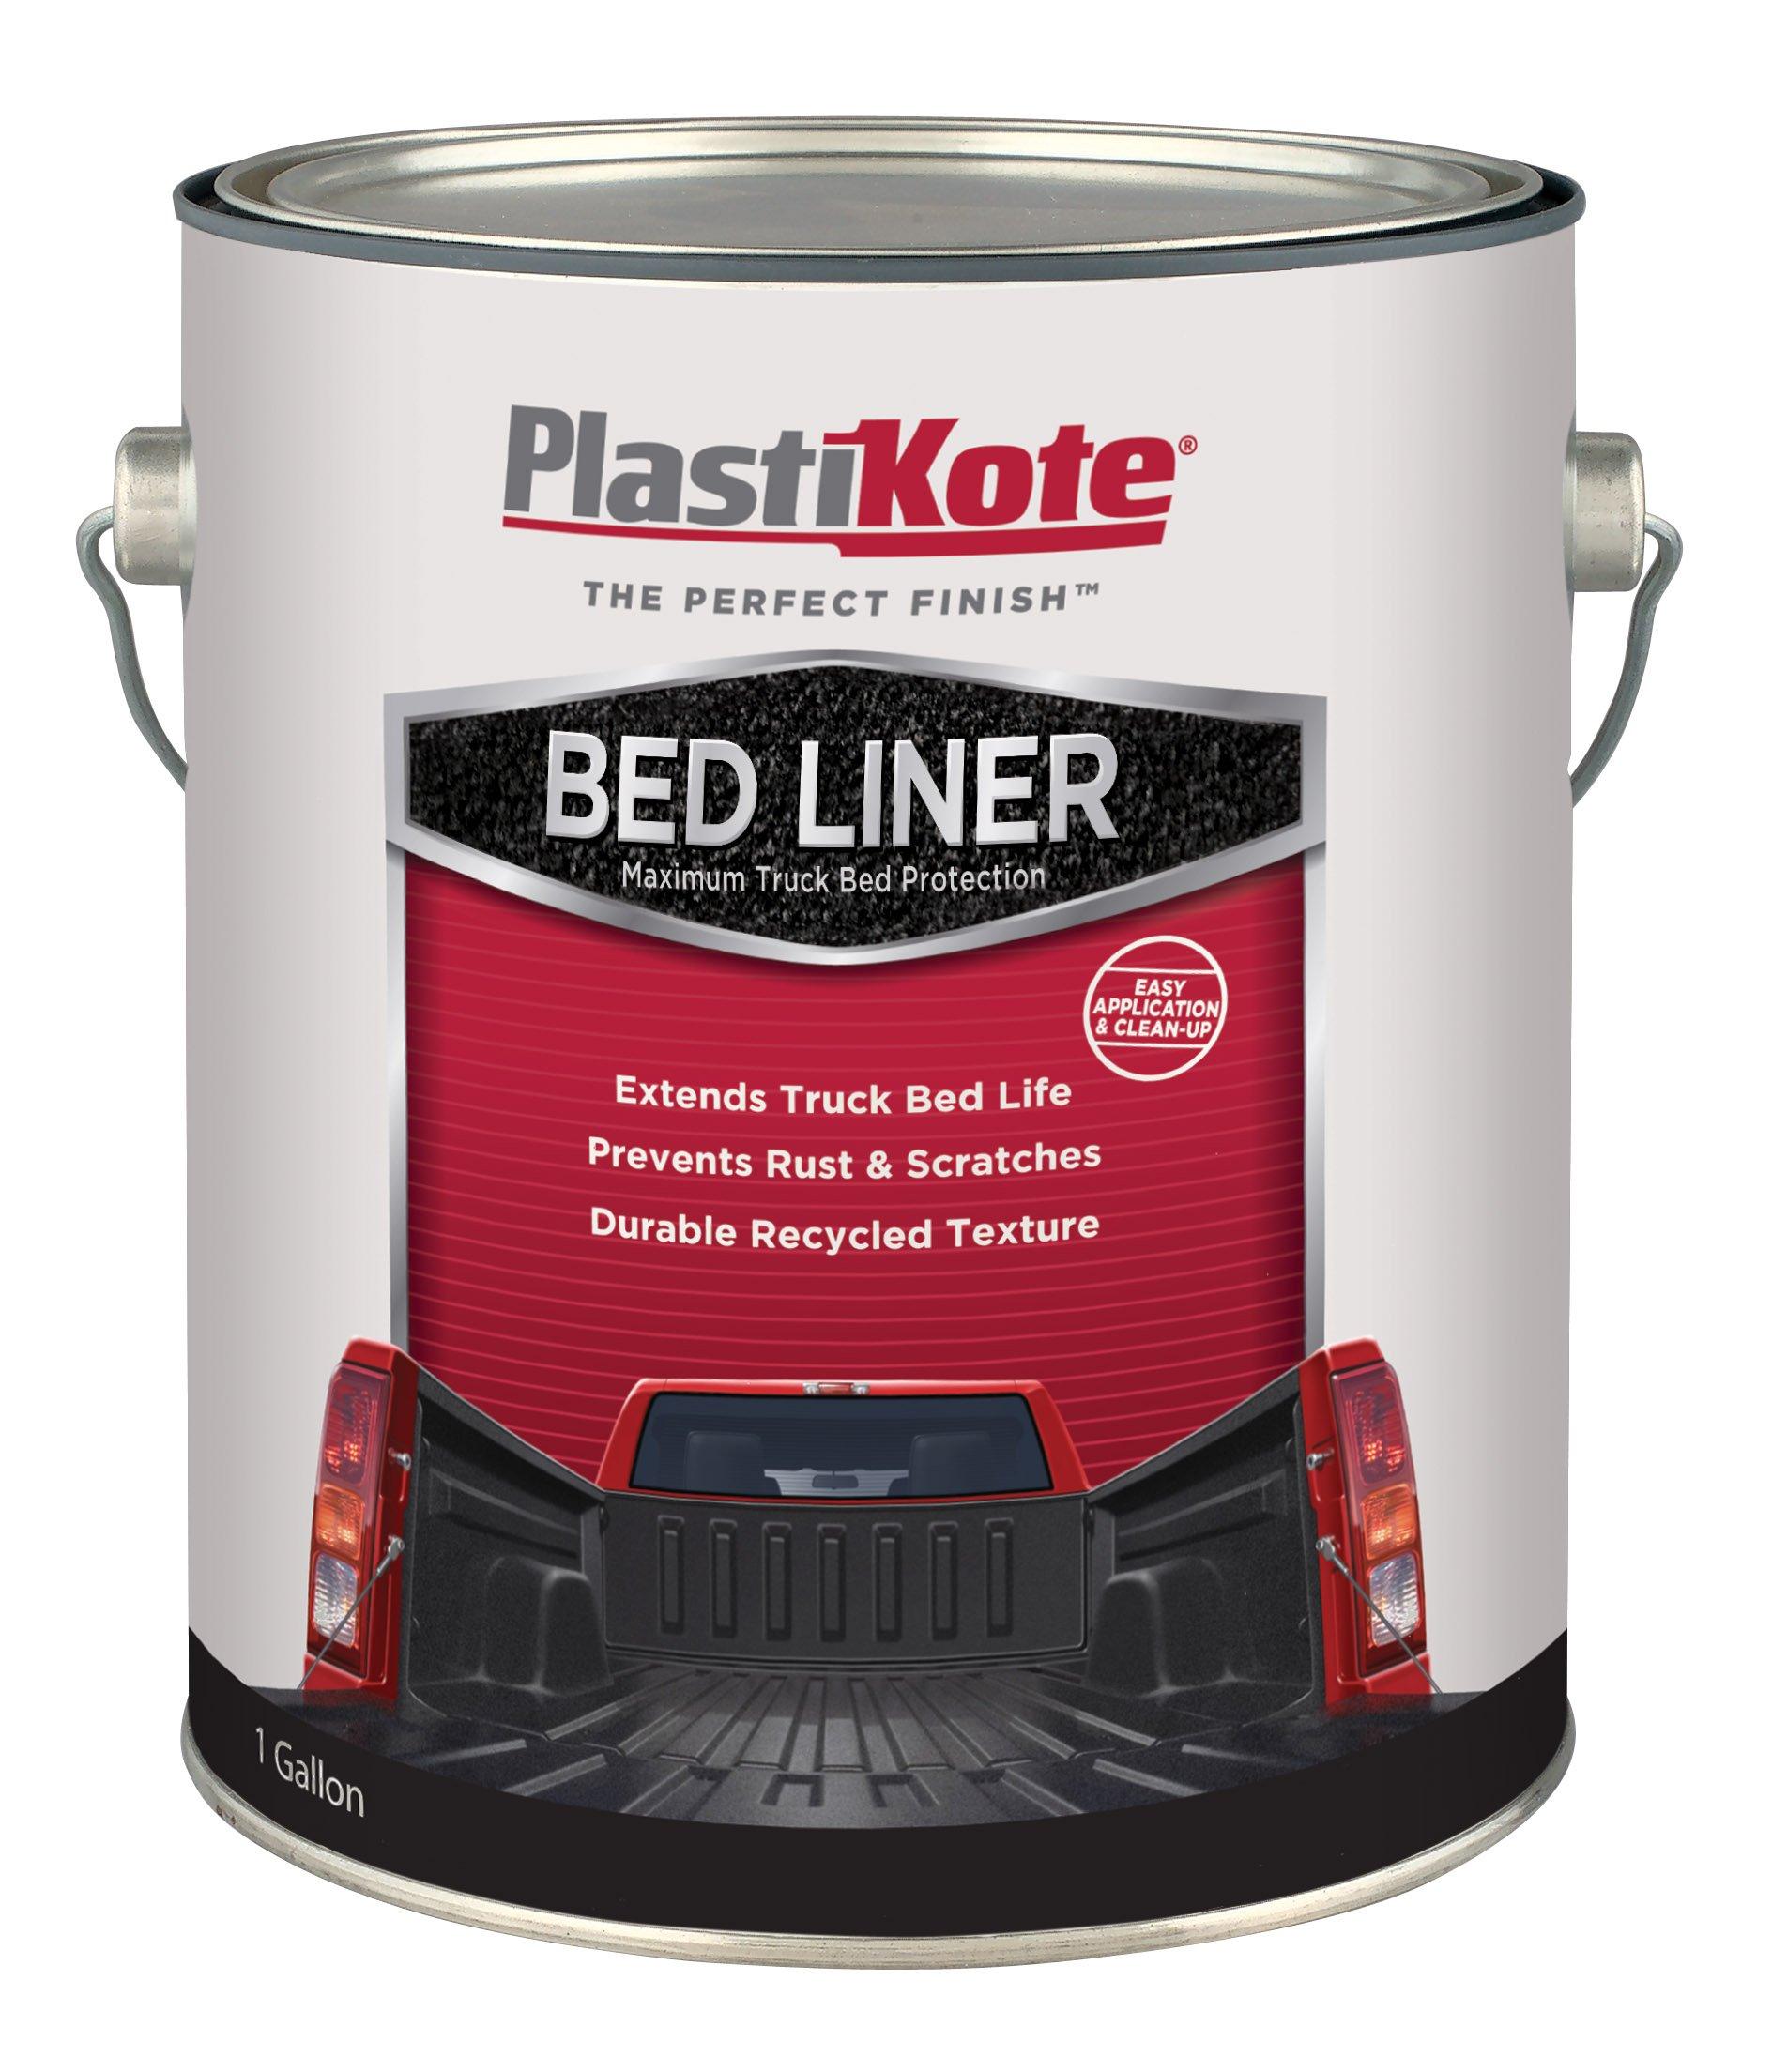 PlastiKote (265G-2PK) Black Truck Bed Liner - 1 Gallon, (Pack of 2) by PlastiKote